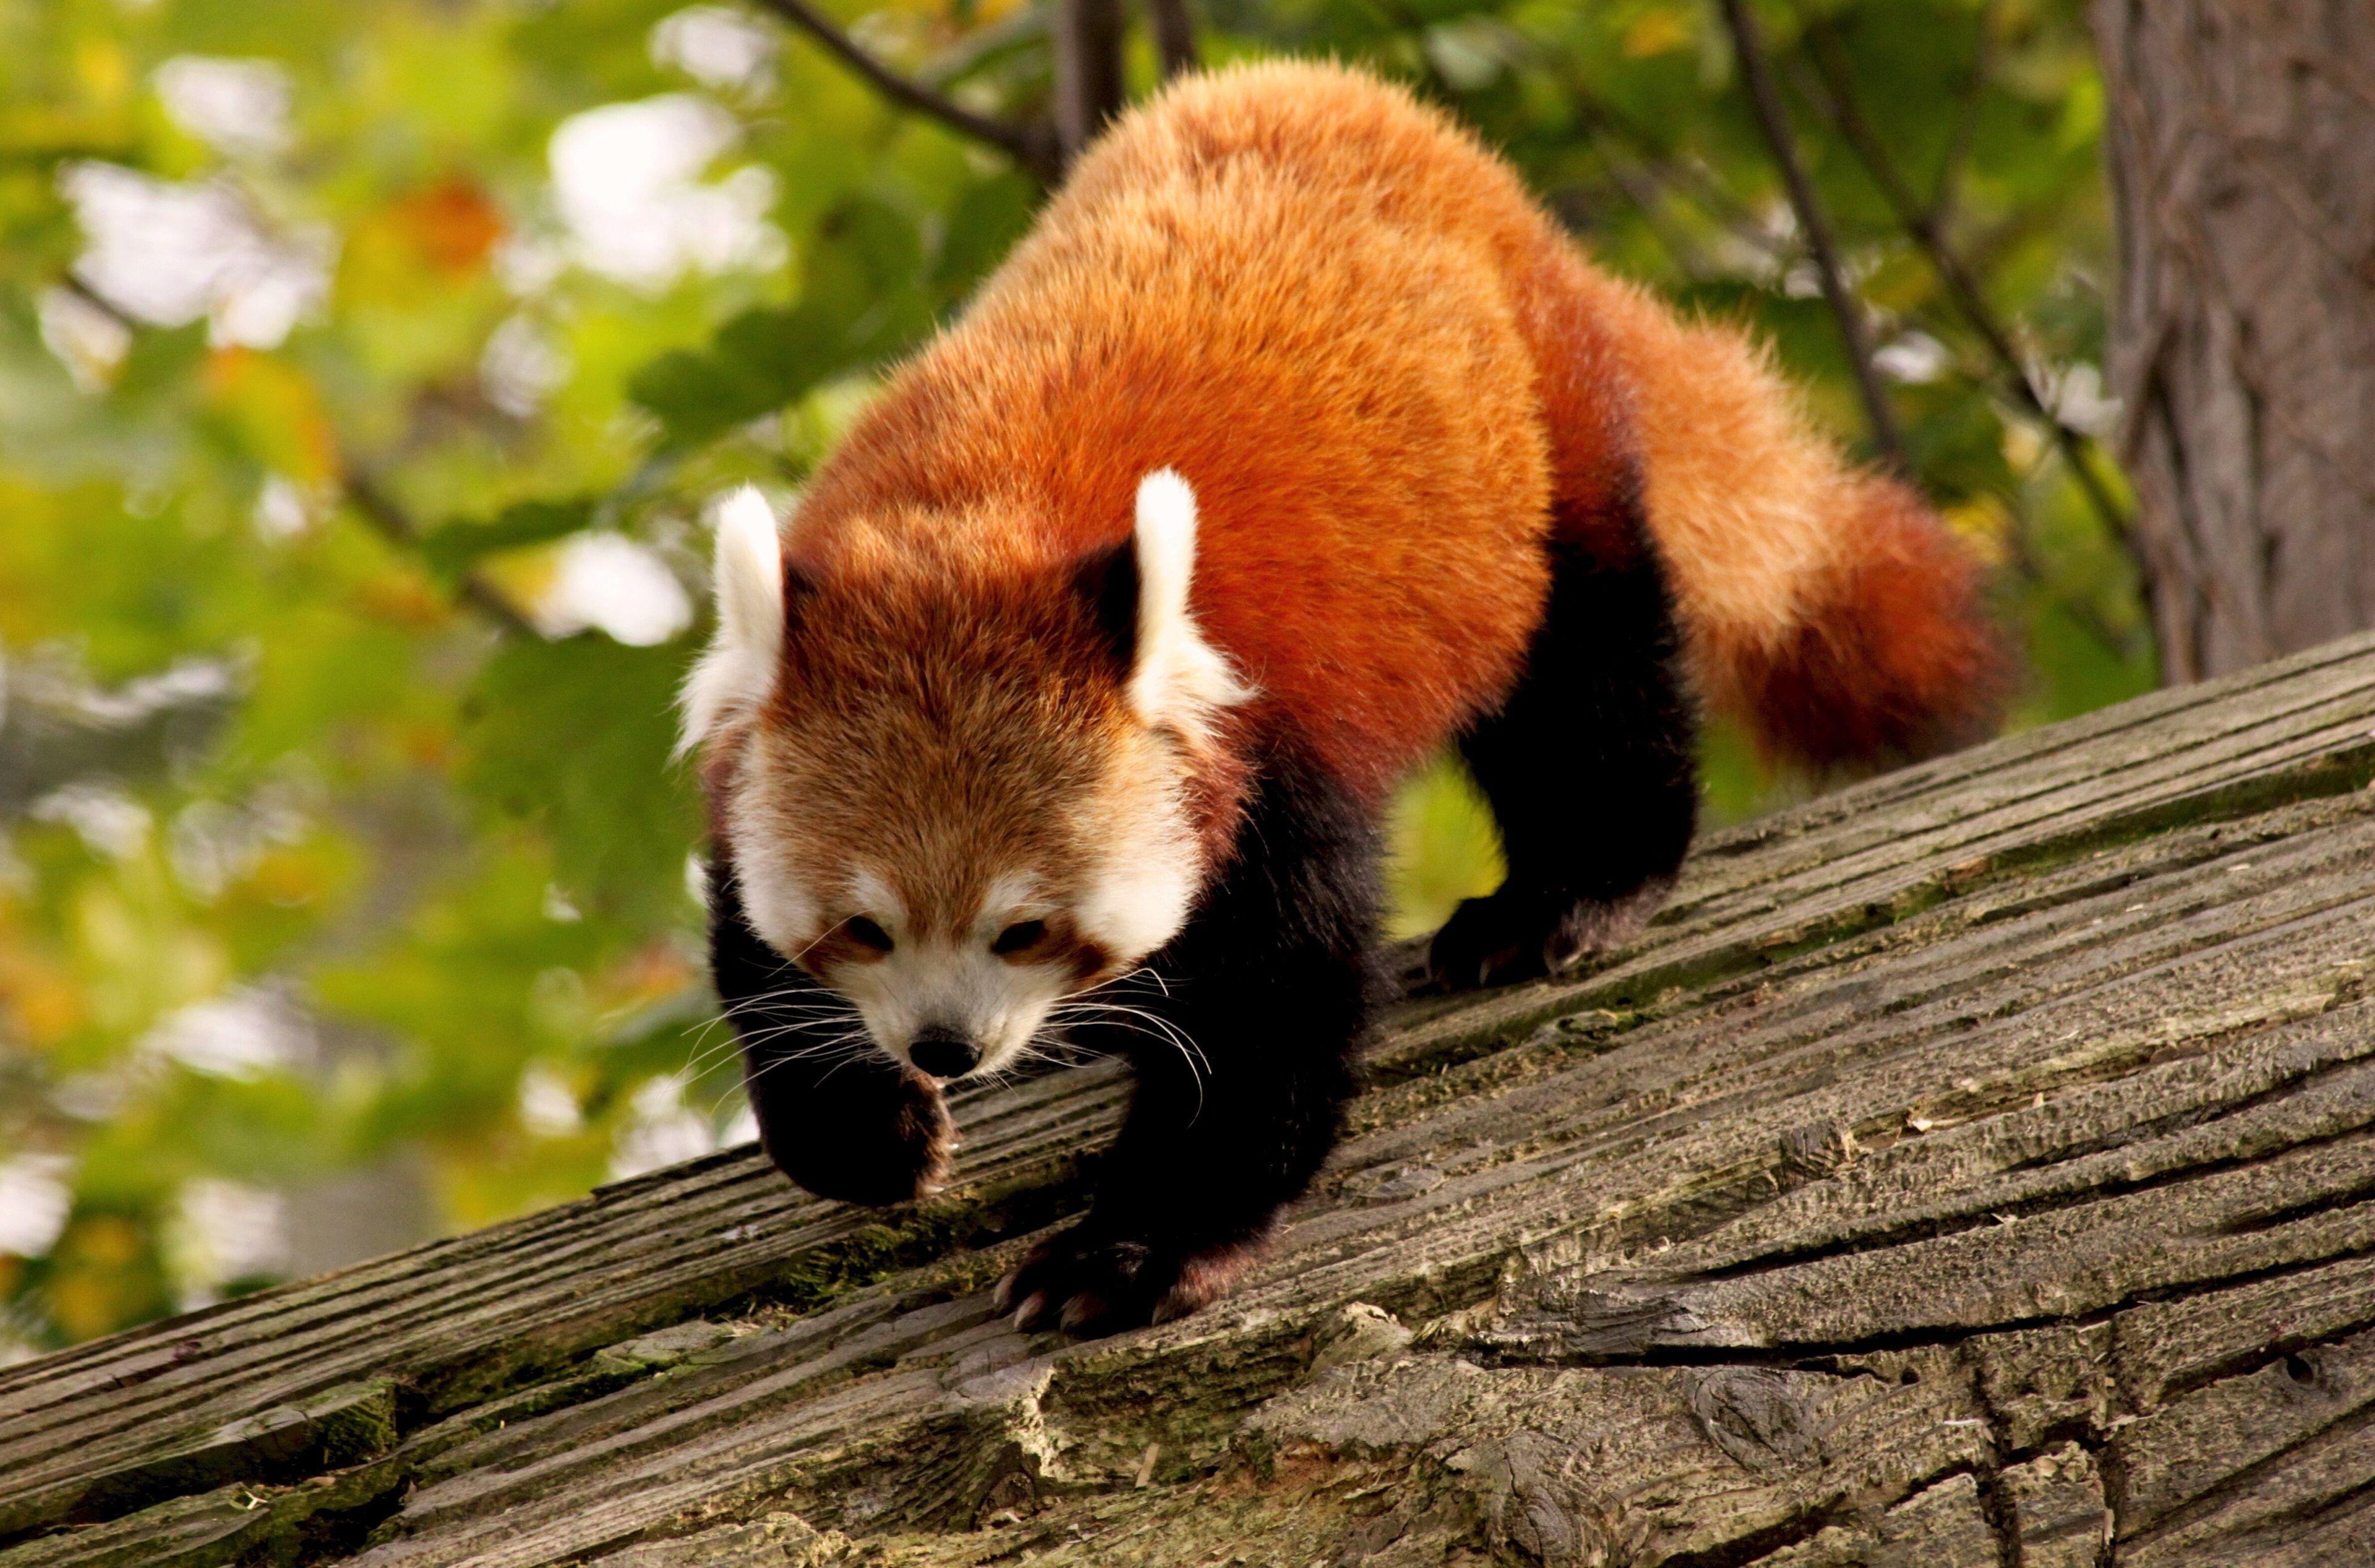 3840x2536 Red Panda 4k Latest Hd Widescreen Wallpaper Free Download Red Panda Panda Wallpapers Red Panda Baby